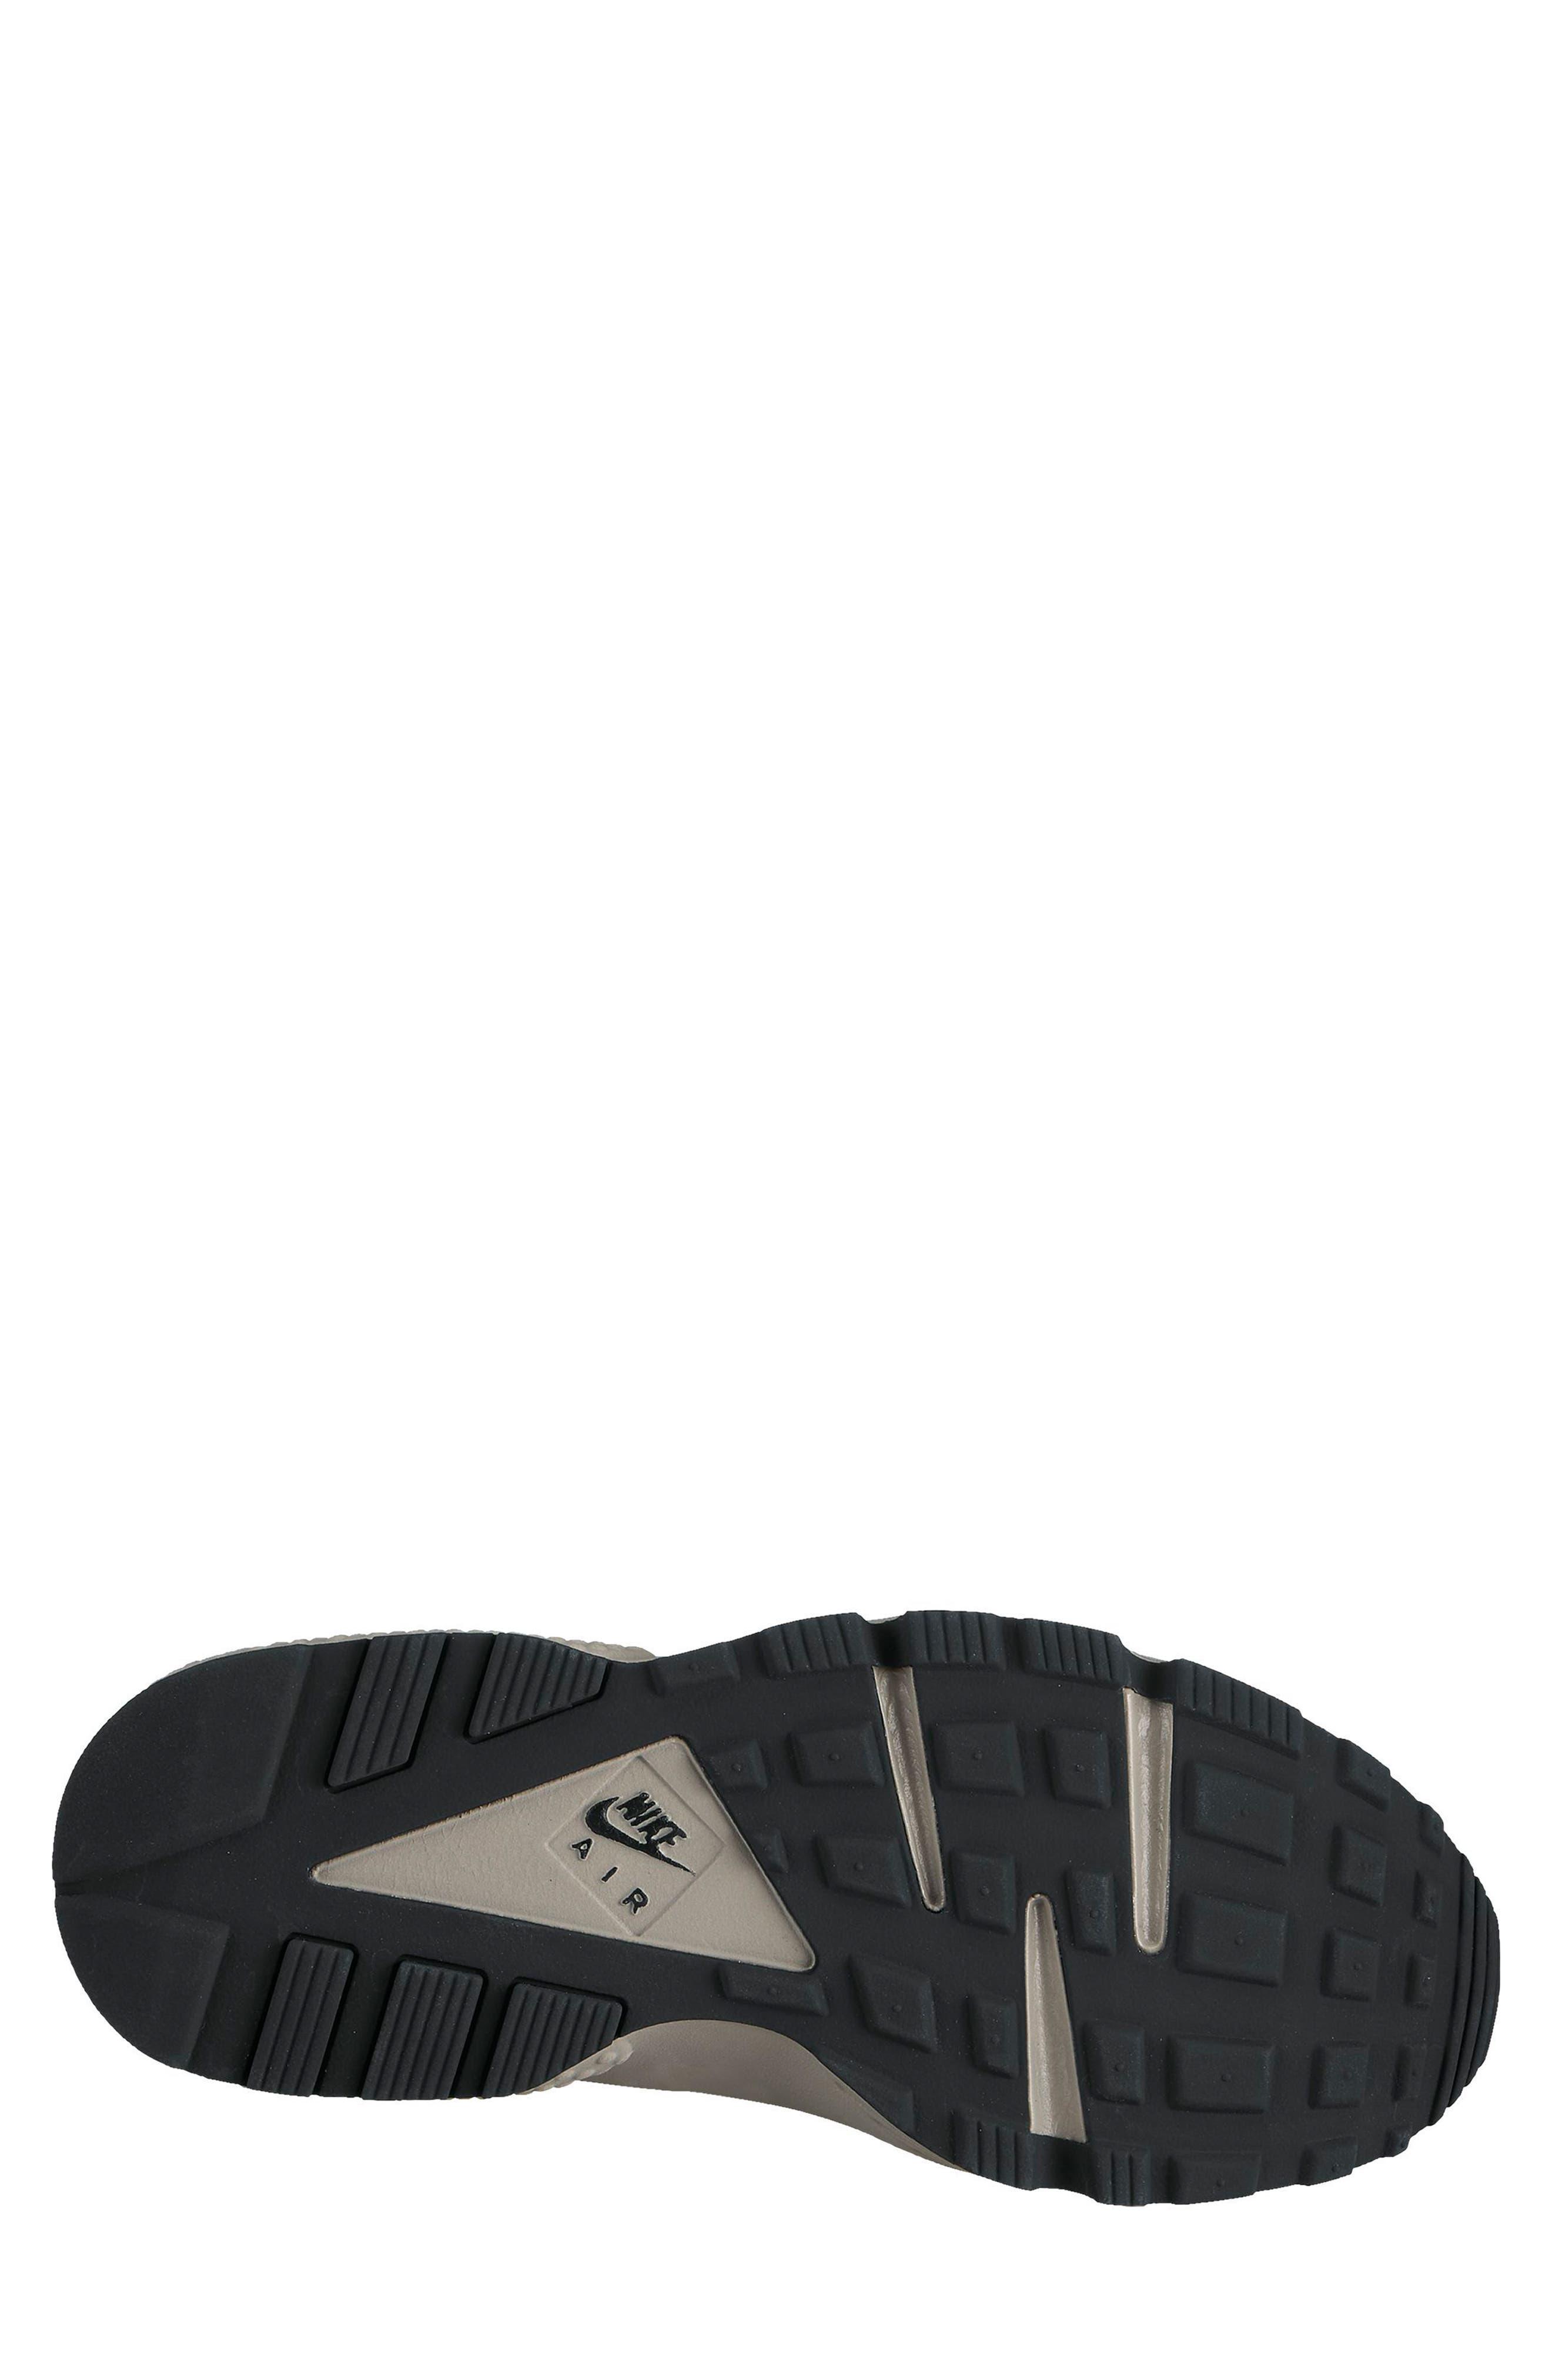 Air Huarache Run SE Sneaker,                             Alternate thumbnail 2, color,                             Black/ Dark Grey/ Cobblestone